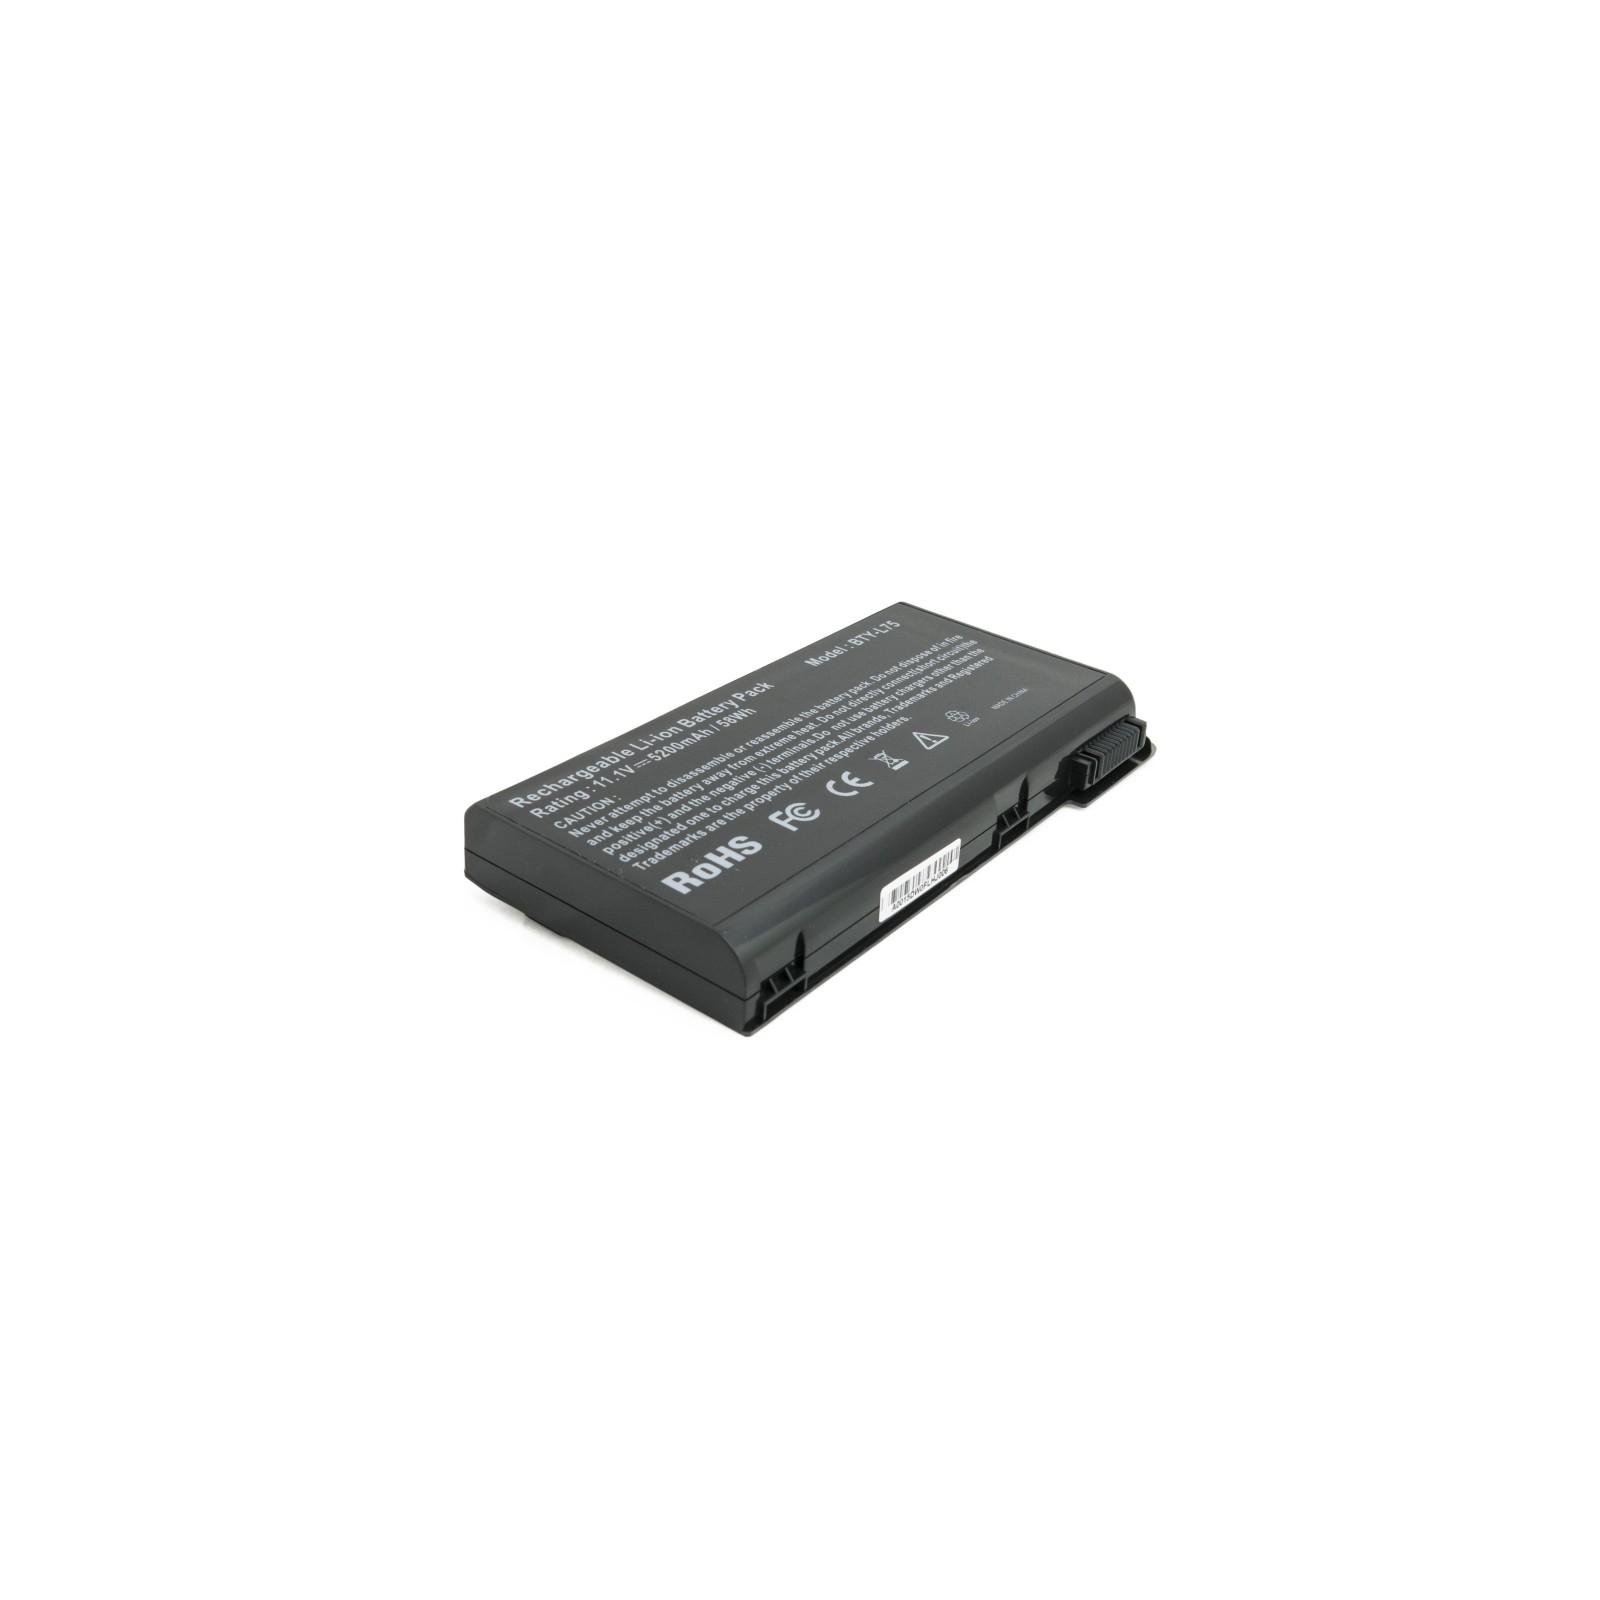 Аккумулятор для ноутбука MSI CX620 (BTY-L75) 5200 mAh EXTRADIGITAL (BNM3956) изображение 2